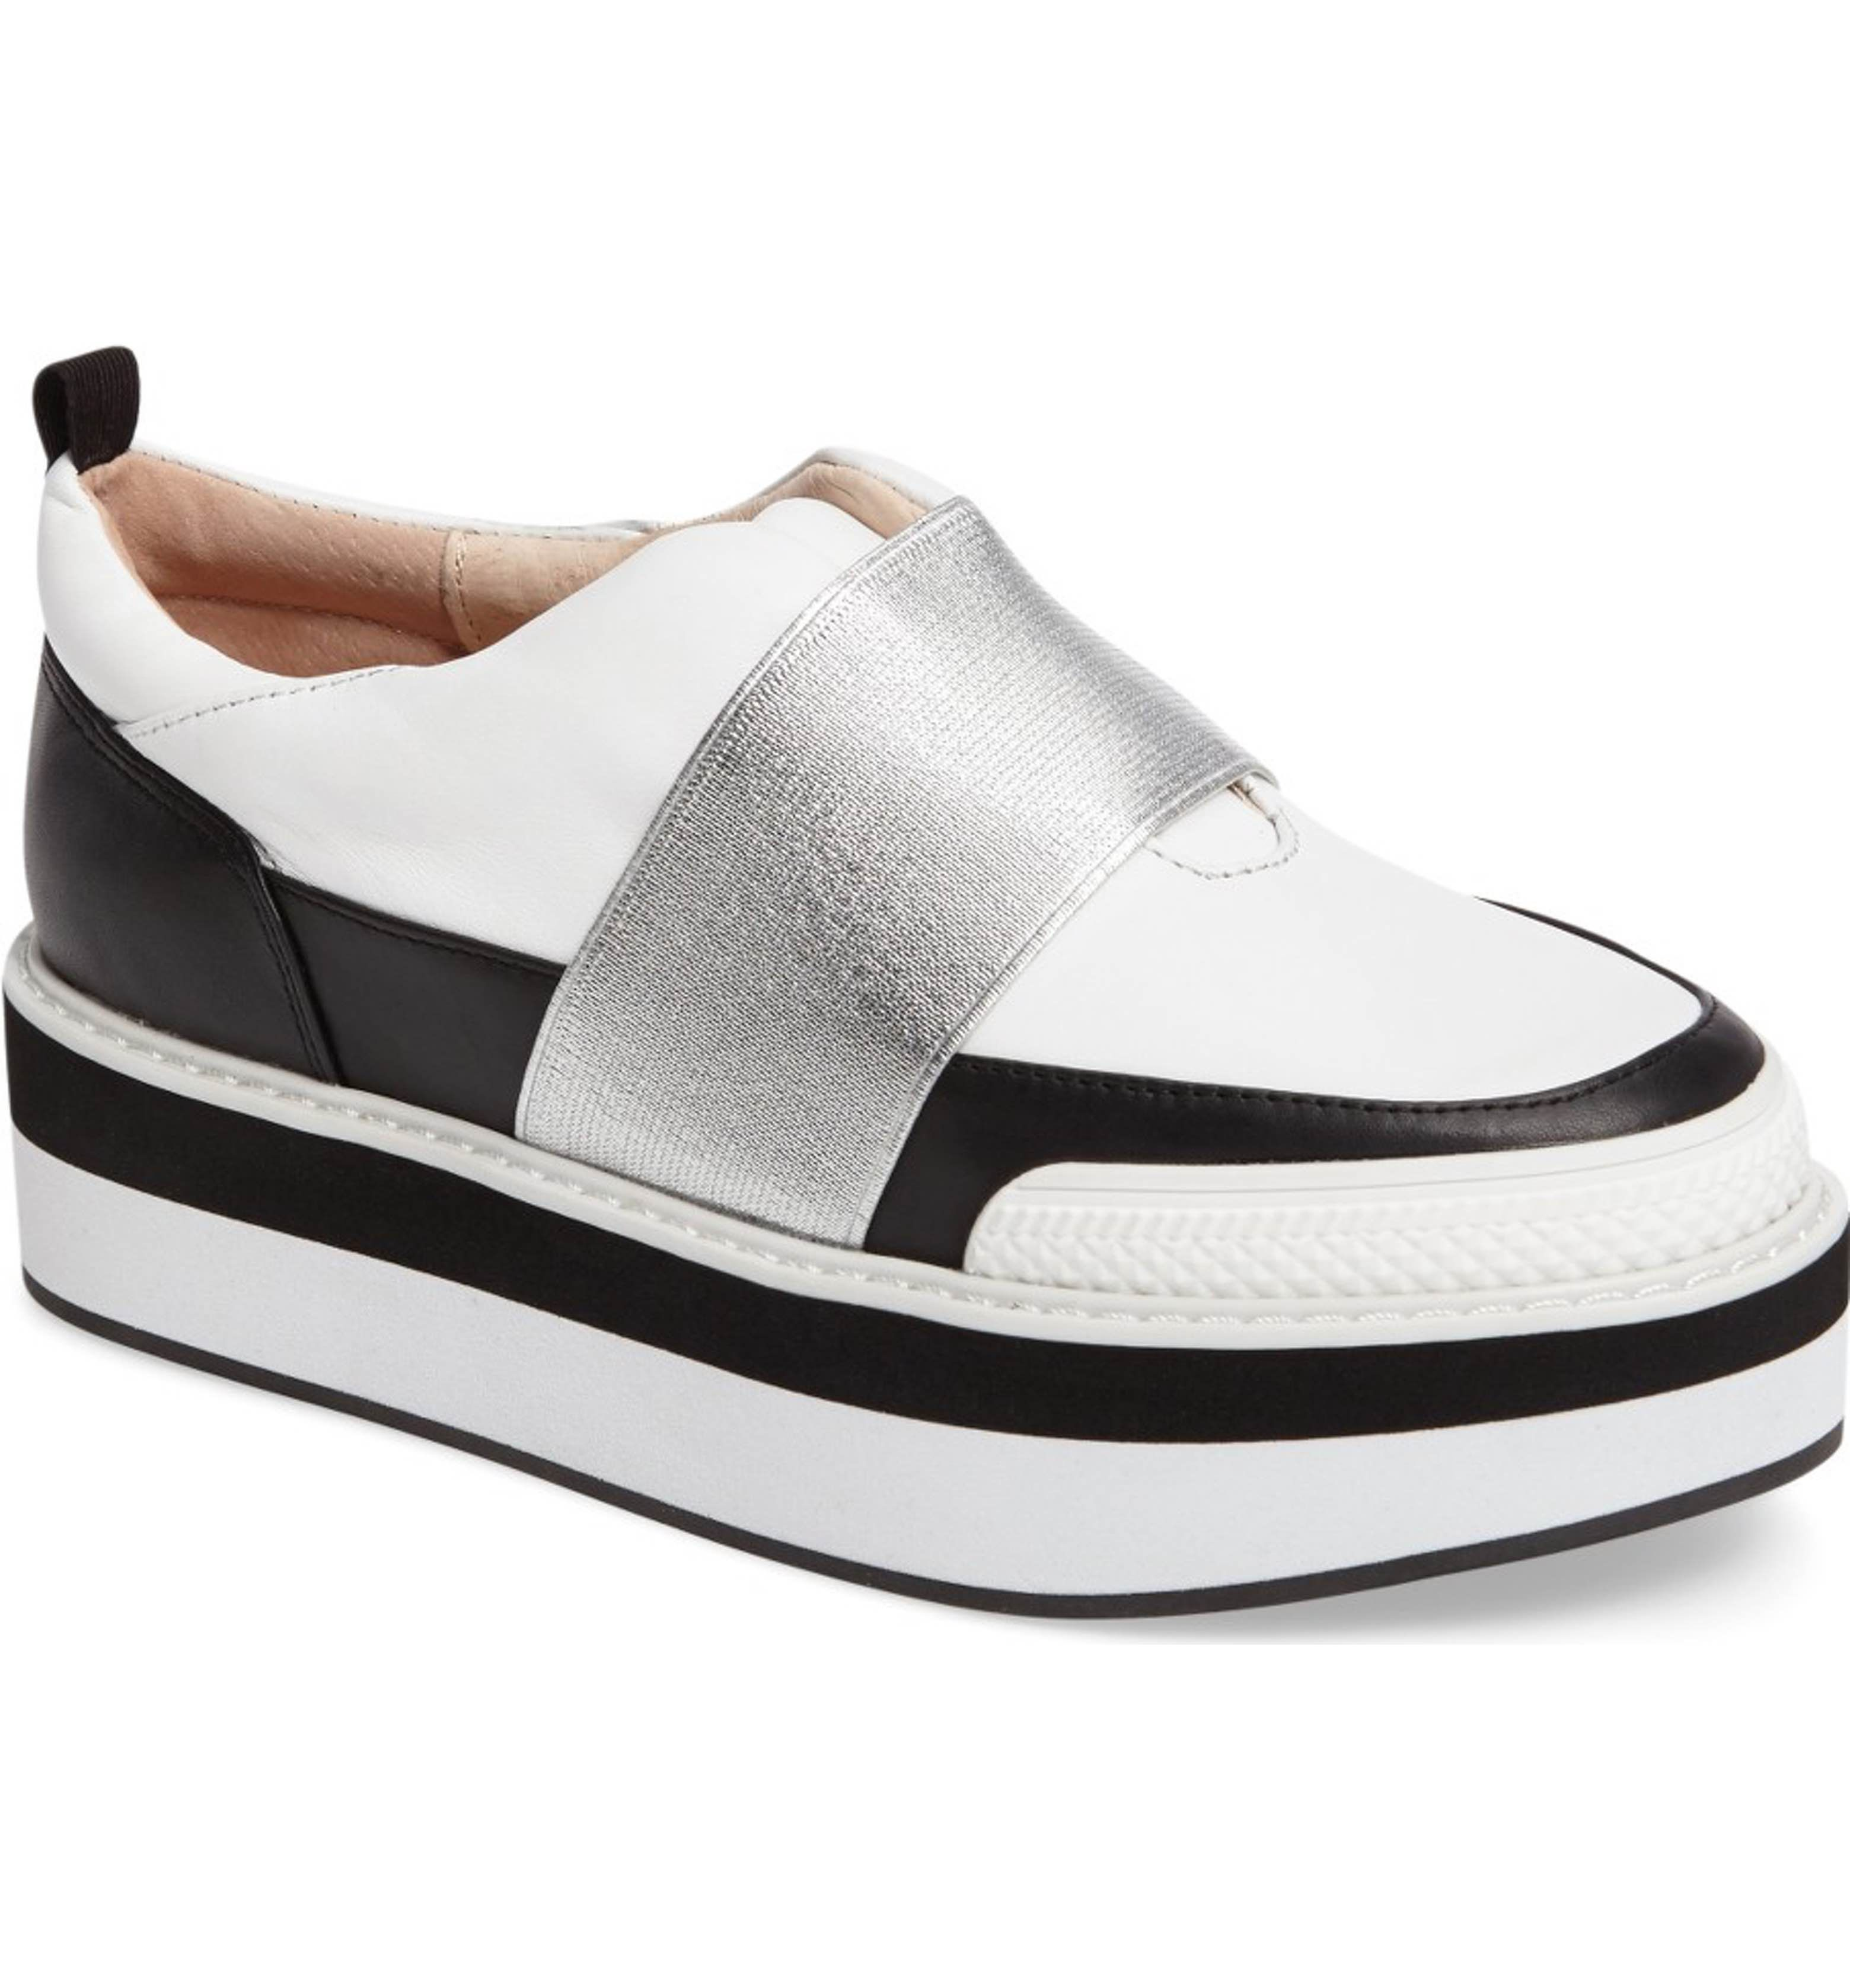 Main Image - Shellys London Damini Slip-On Platform Sneaker (Women)